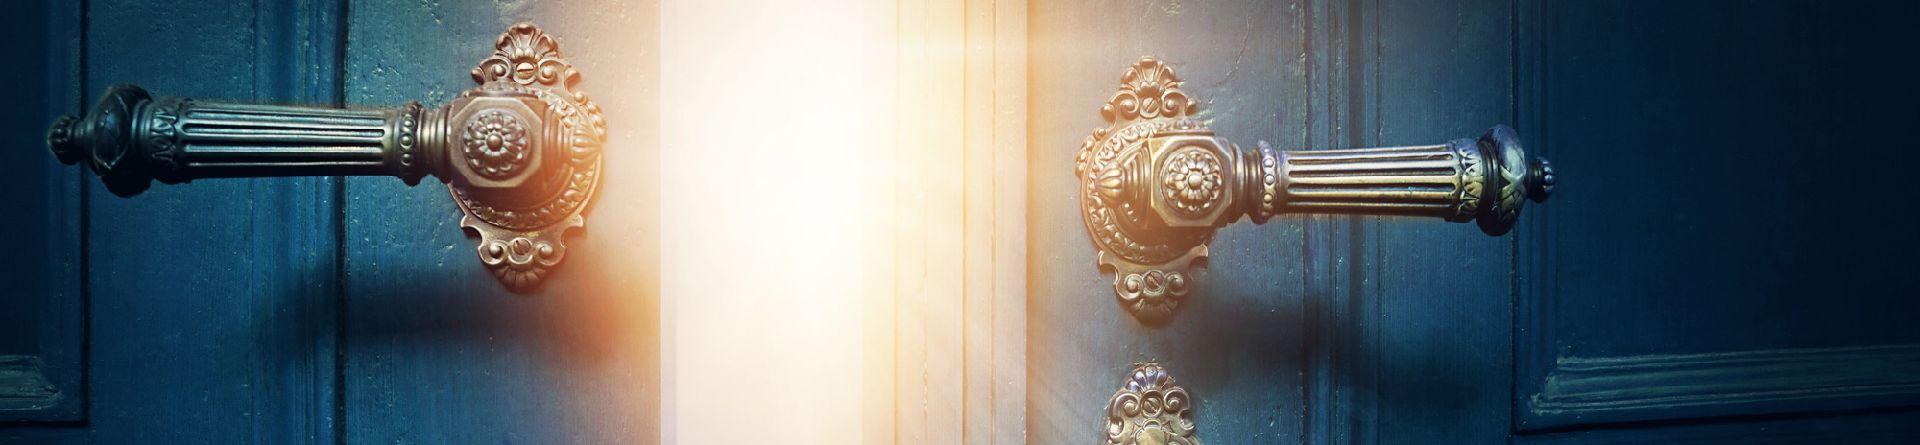 türen renovieren | bma - burkhartsmaier malerarbeiten - roth